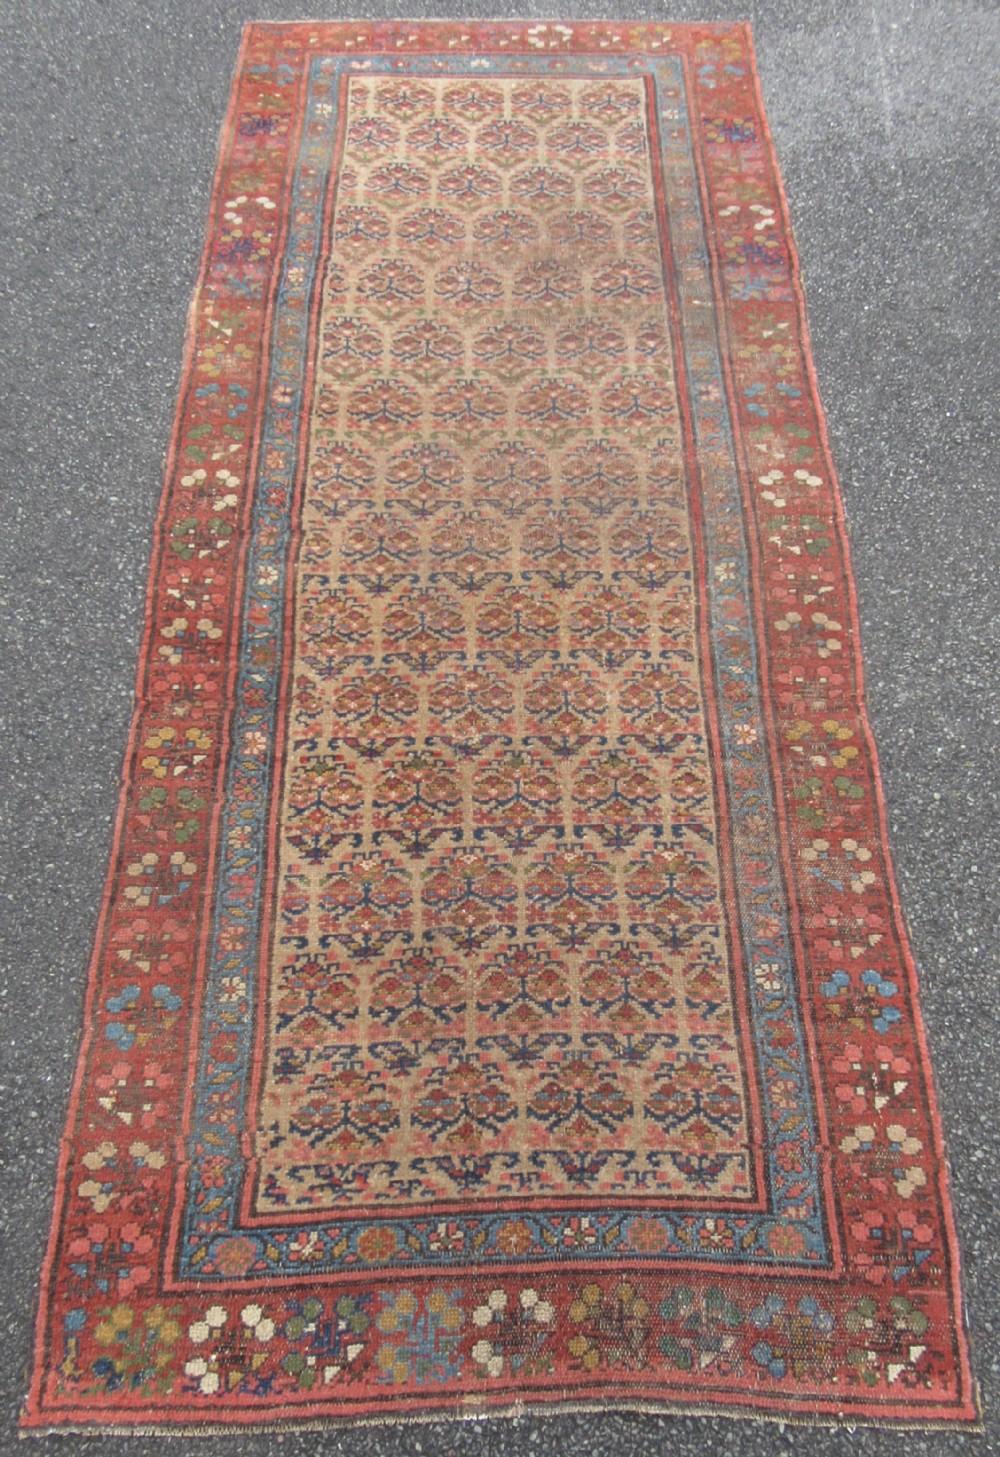 Antique Country House Shabby Chic Persian Kurdish Long Rug Runner 722484 Sellingantiques Co Uk